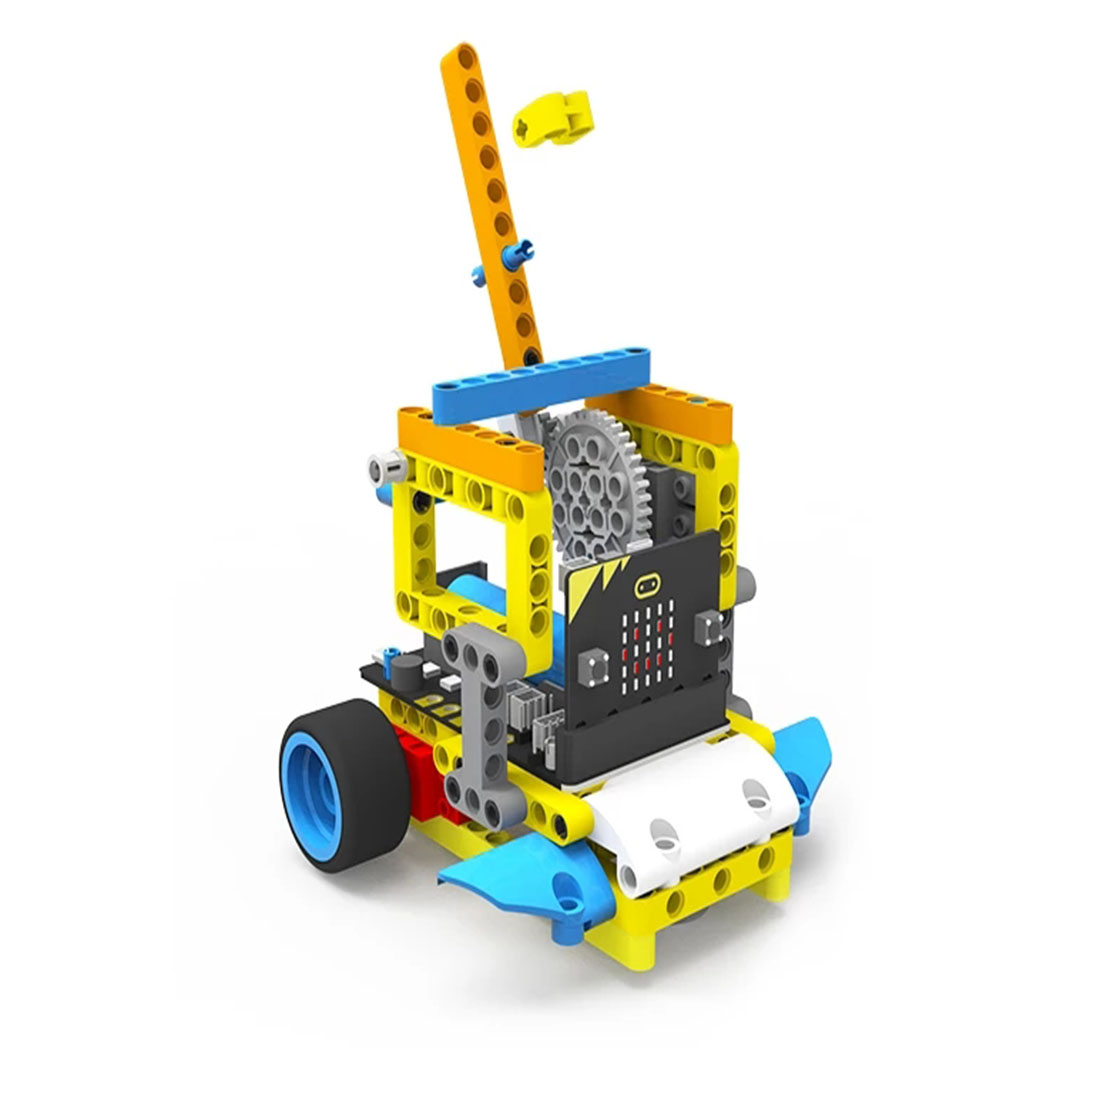 Program Intelligent Robot Building Block Car Kit Various Shapes Steam Programming Education Car For Micro:bit(Micro:bit Board)